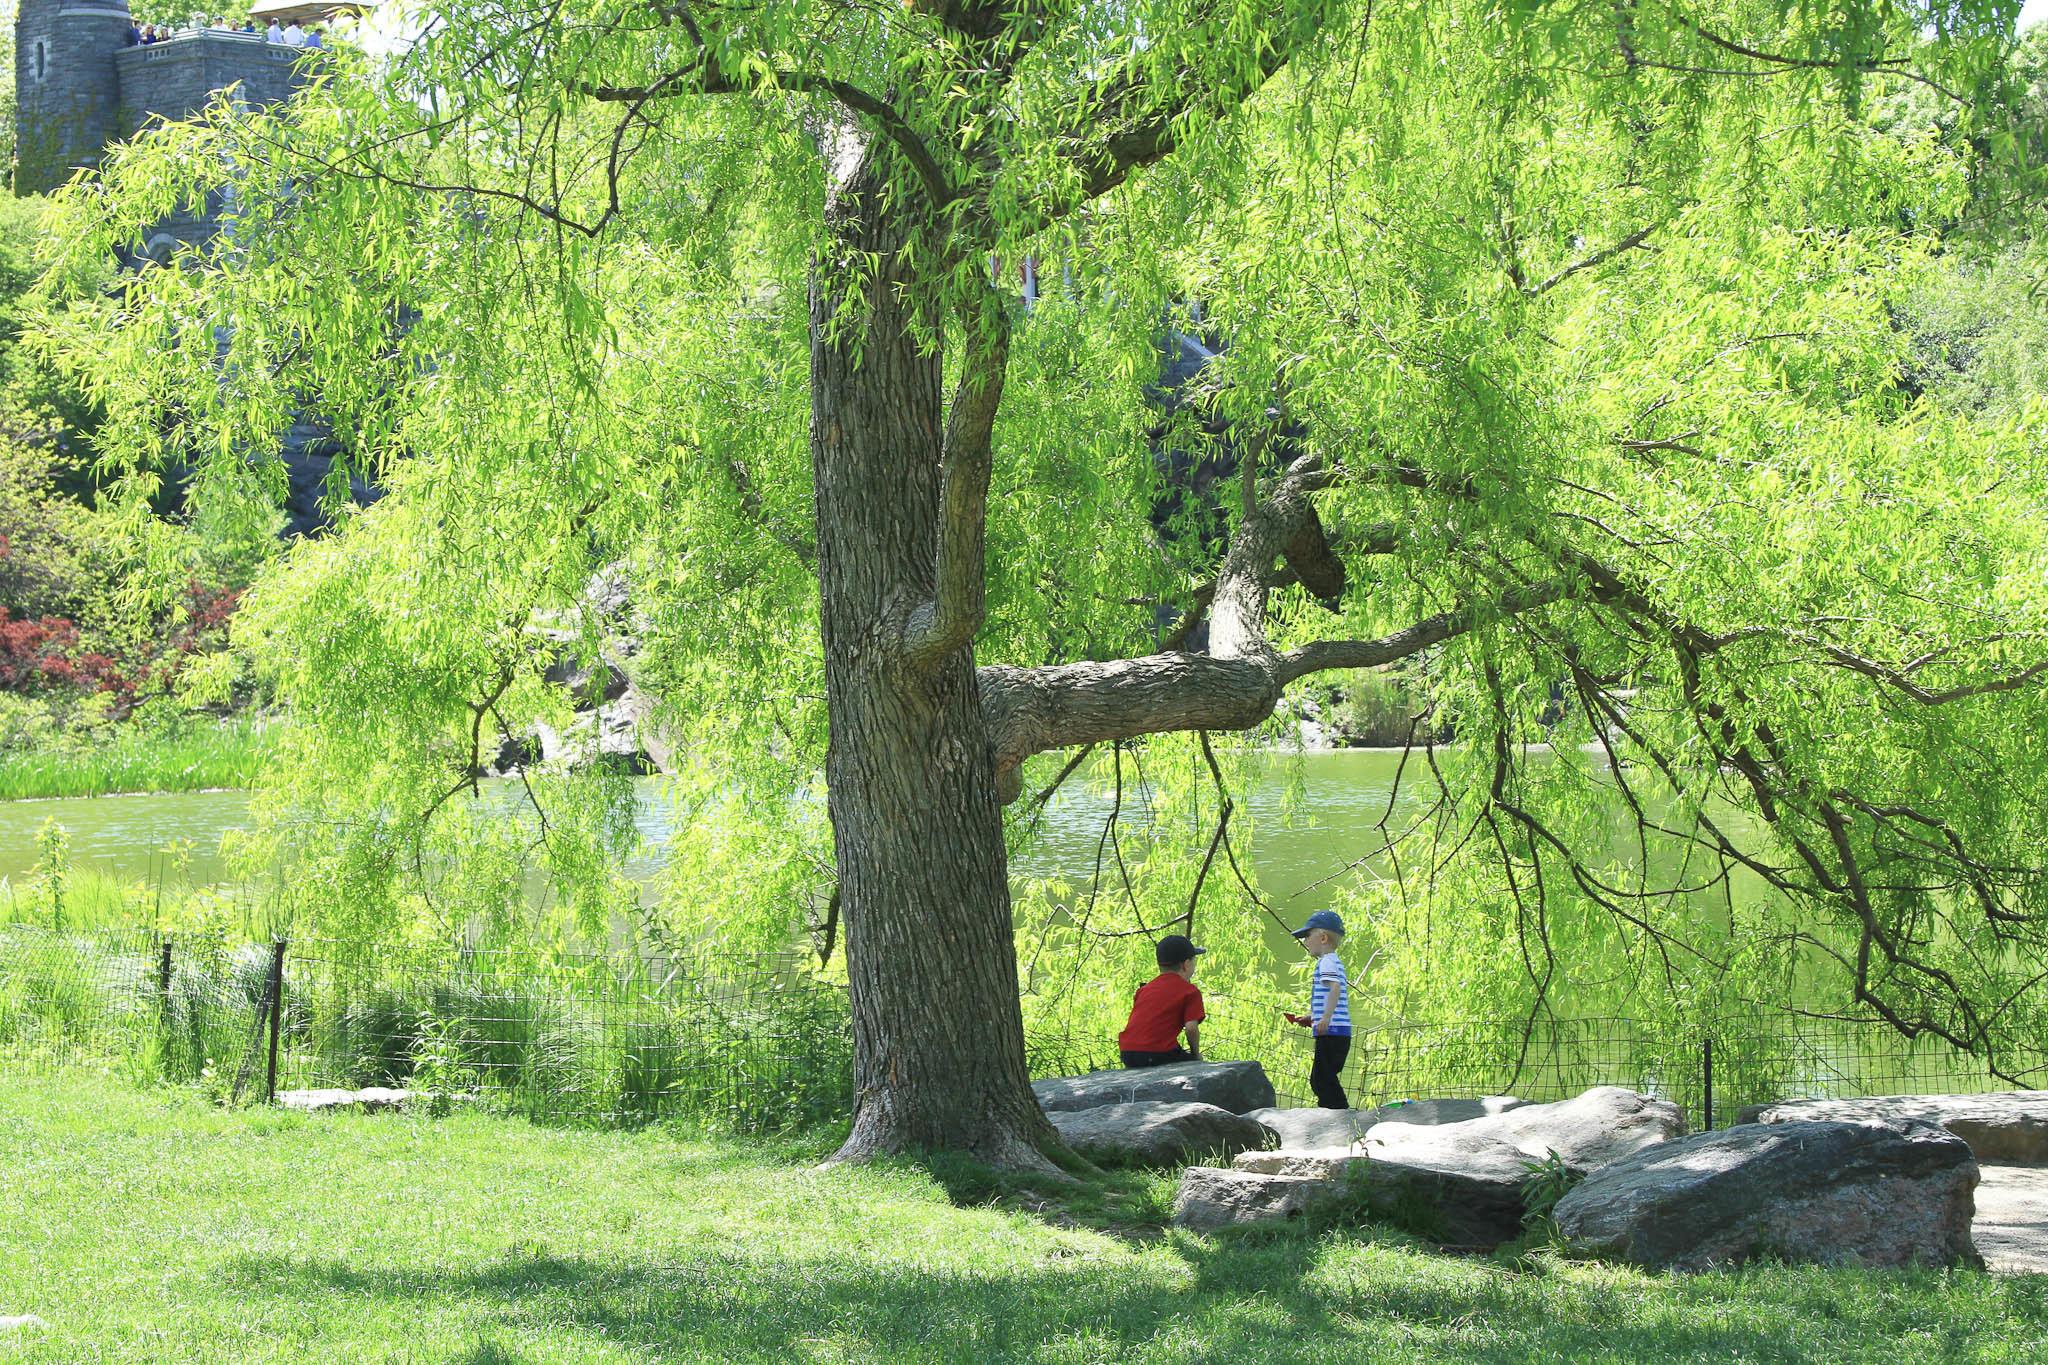 Central Park in New York, spring 2013